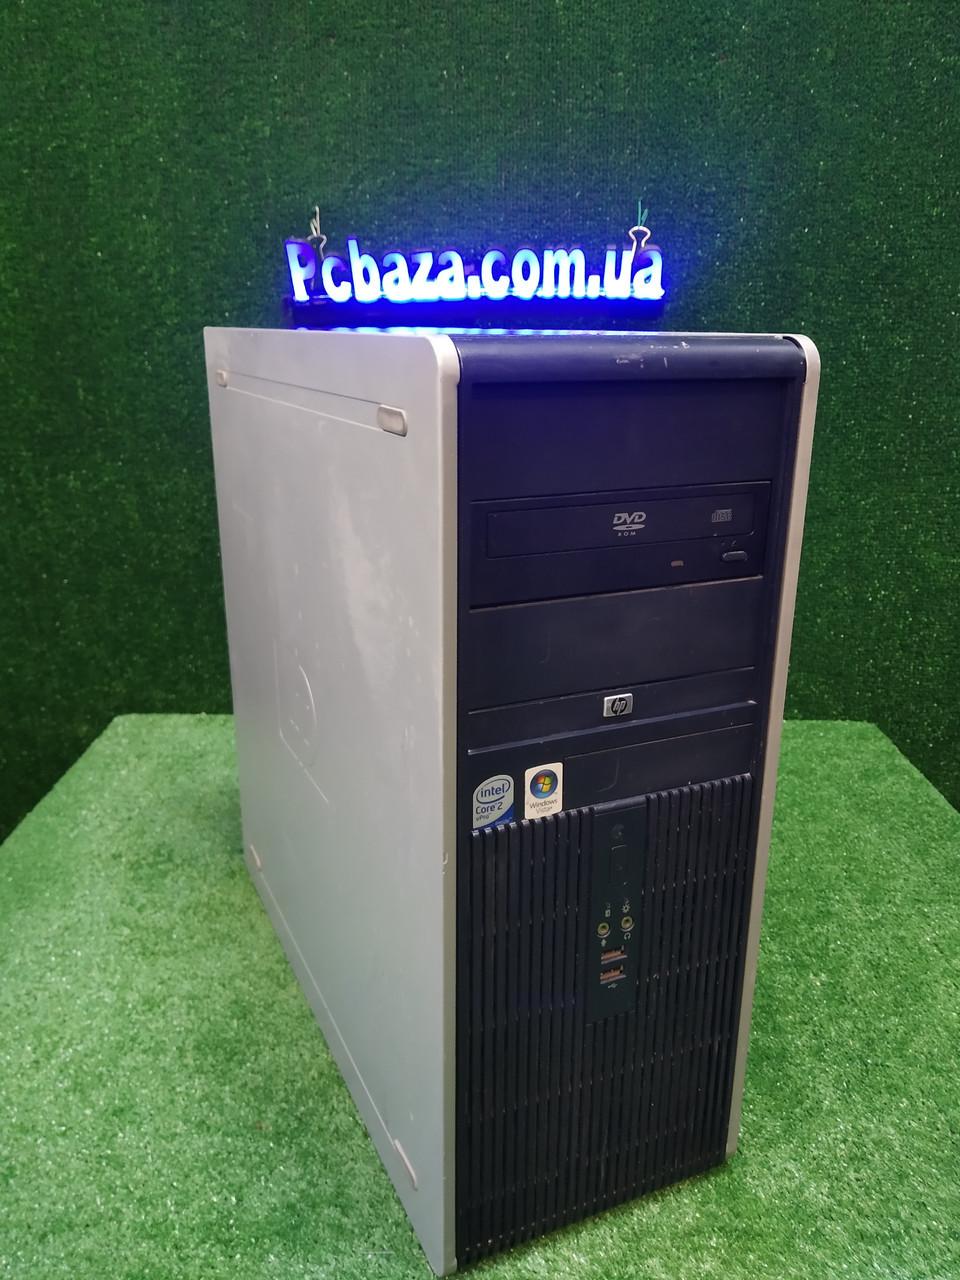 Компьютер HP dc 7800, Intel 2 мощных ядра E8400 3.0 Ггц, 4 ГБ, 80 ГБ Настроен! Есть Опт! Гарантия!